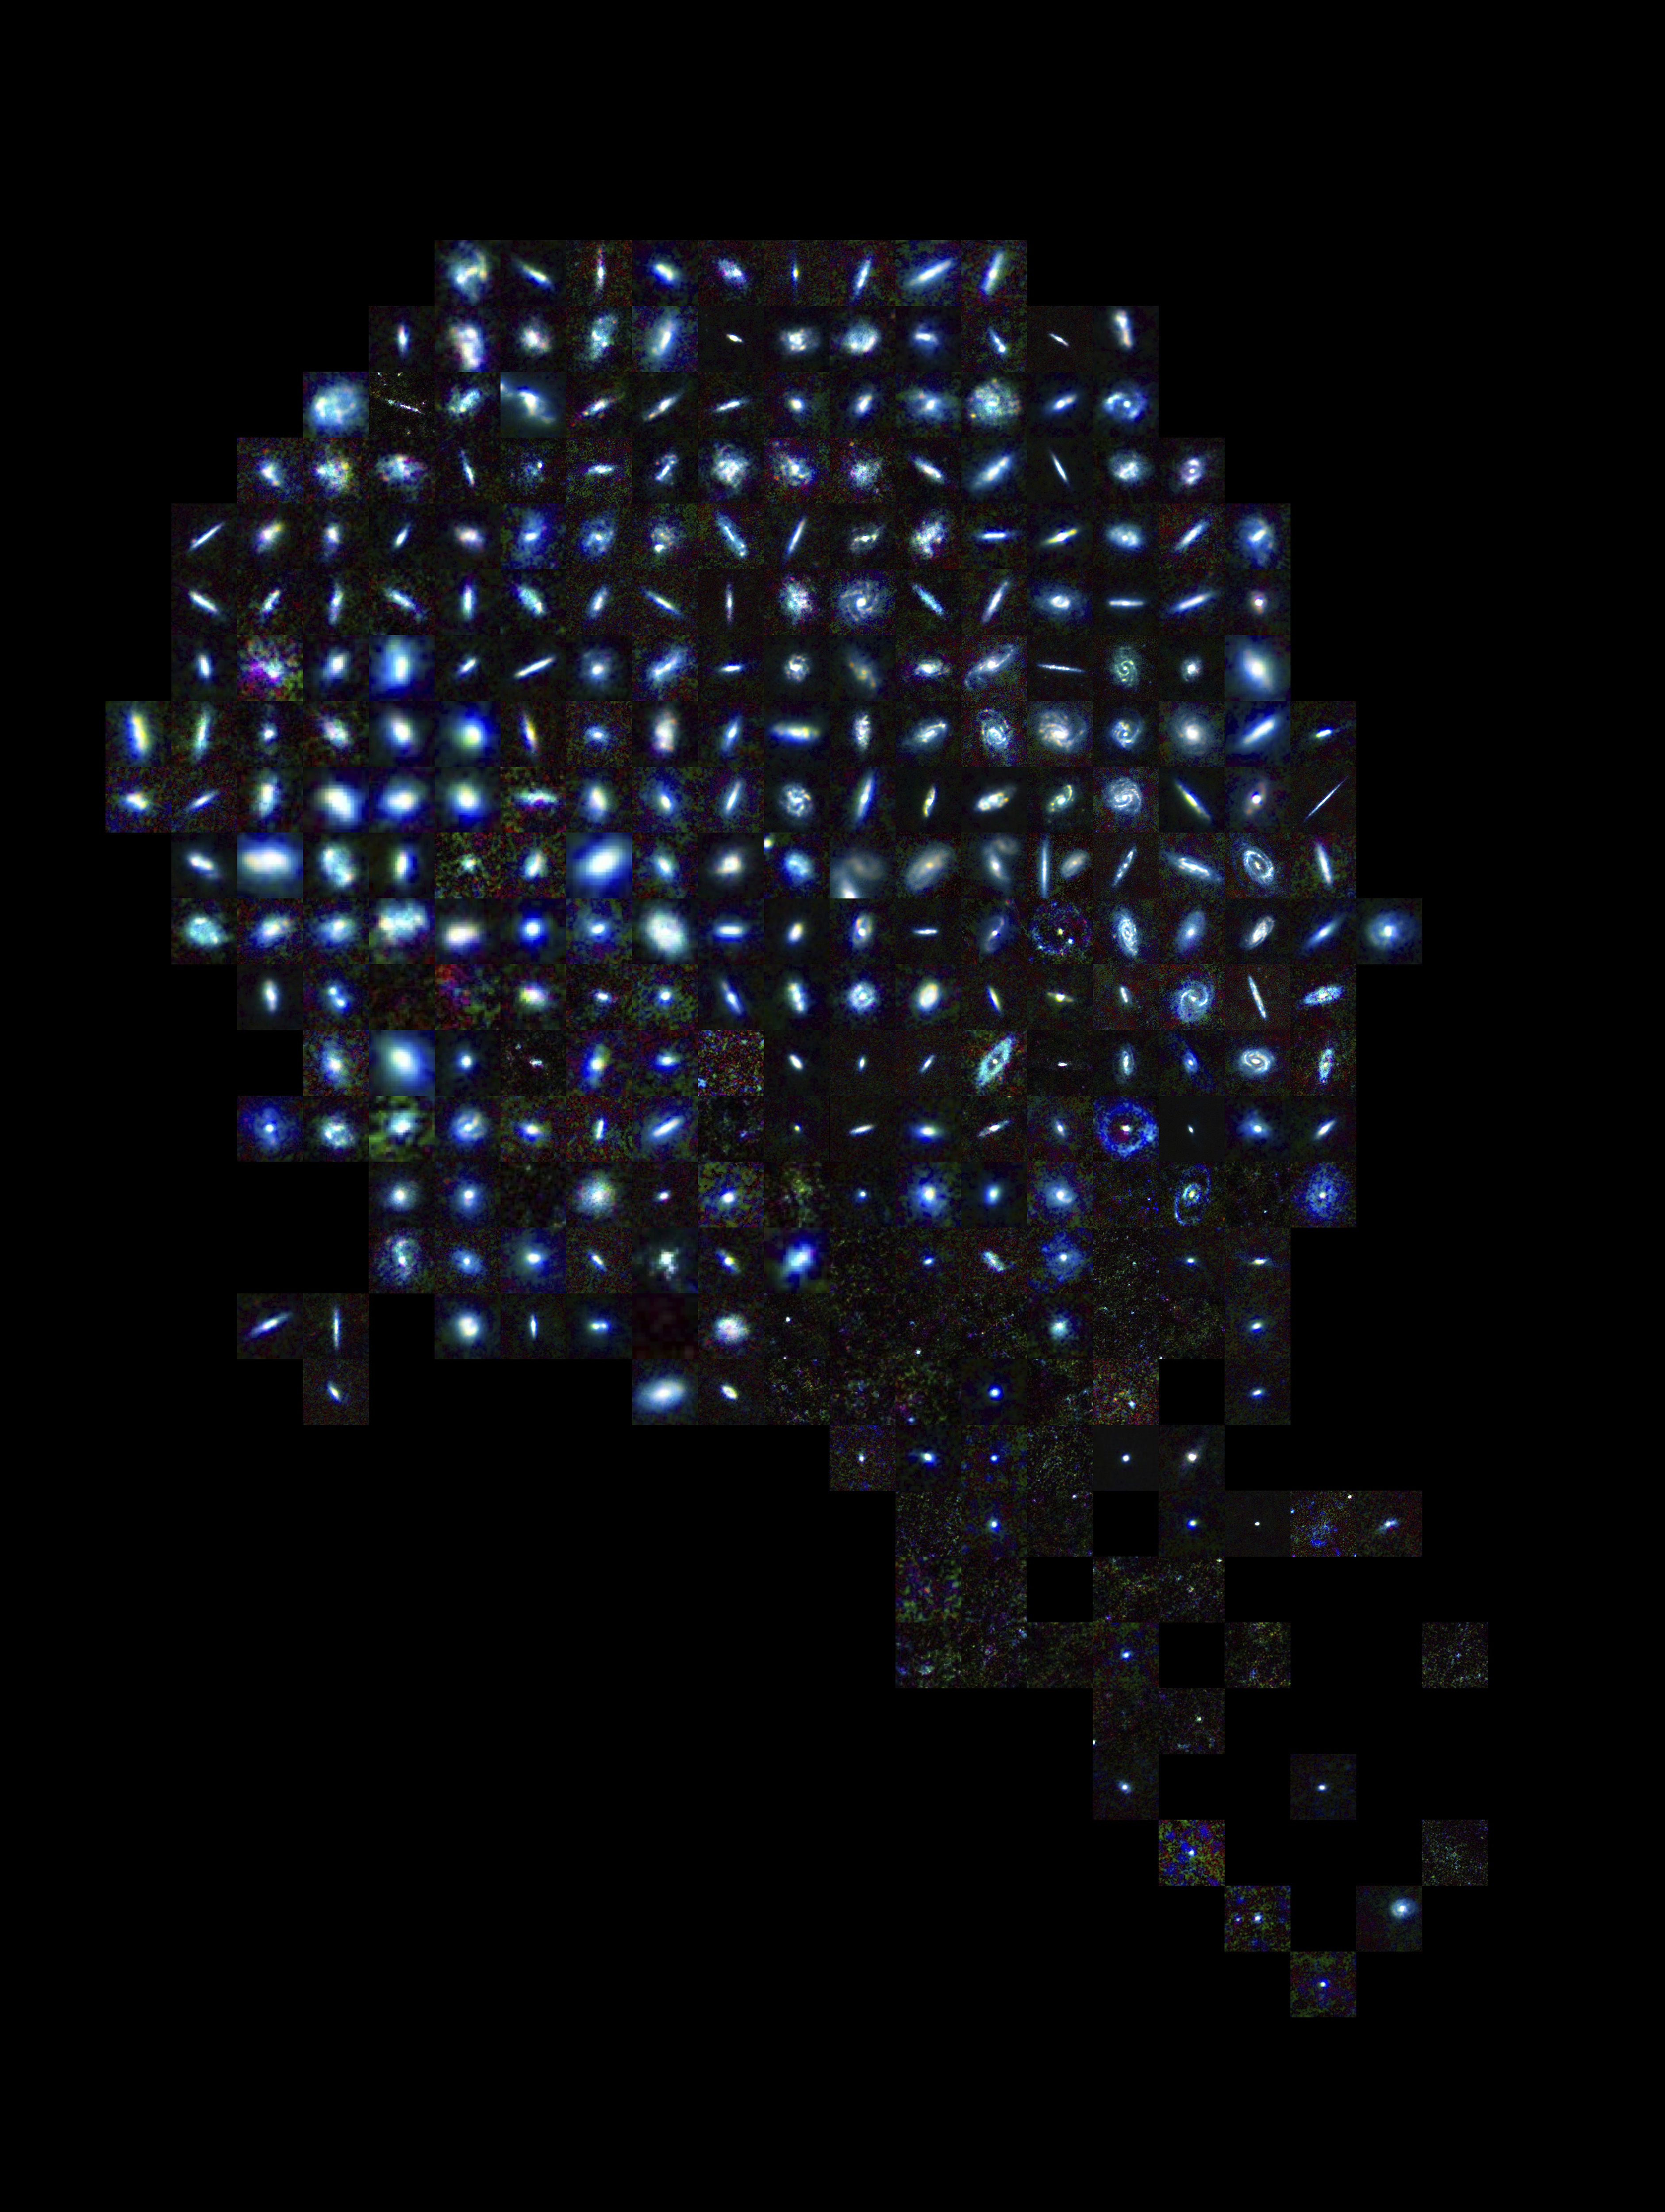 1567216459757-Herschel_Reference_Survey_mosaic_4k.jpg